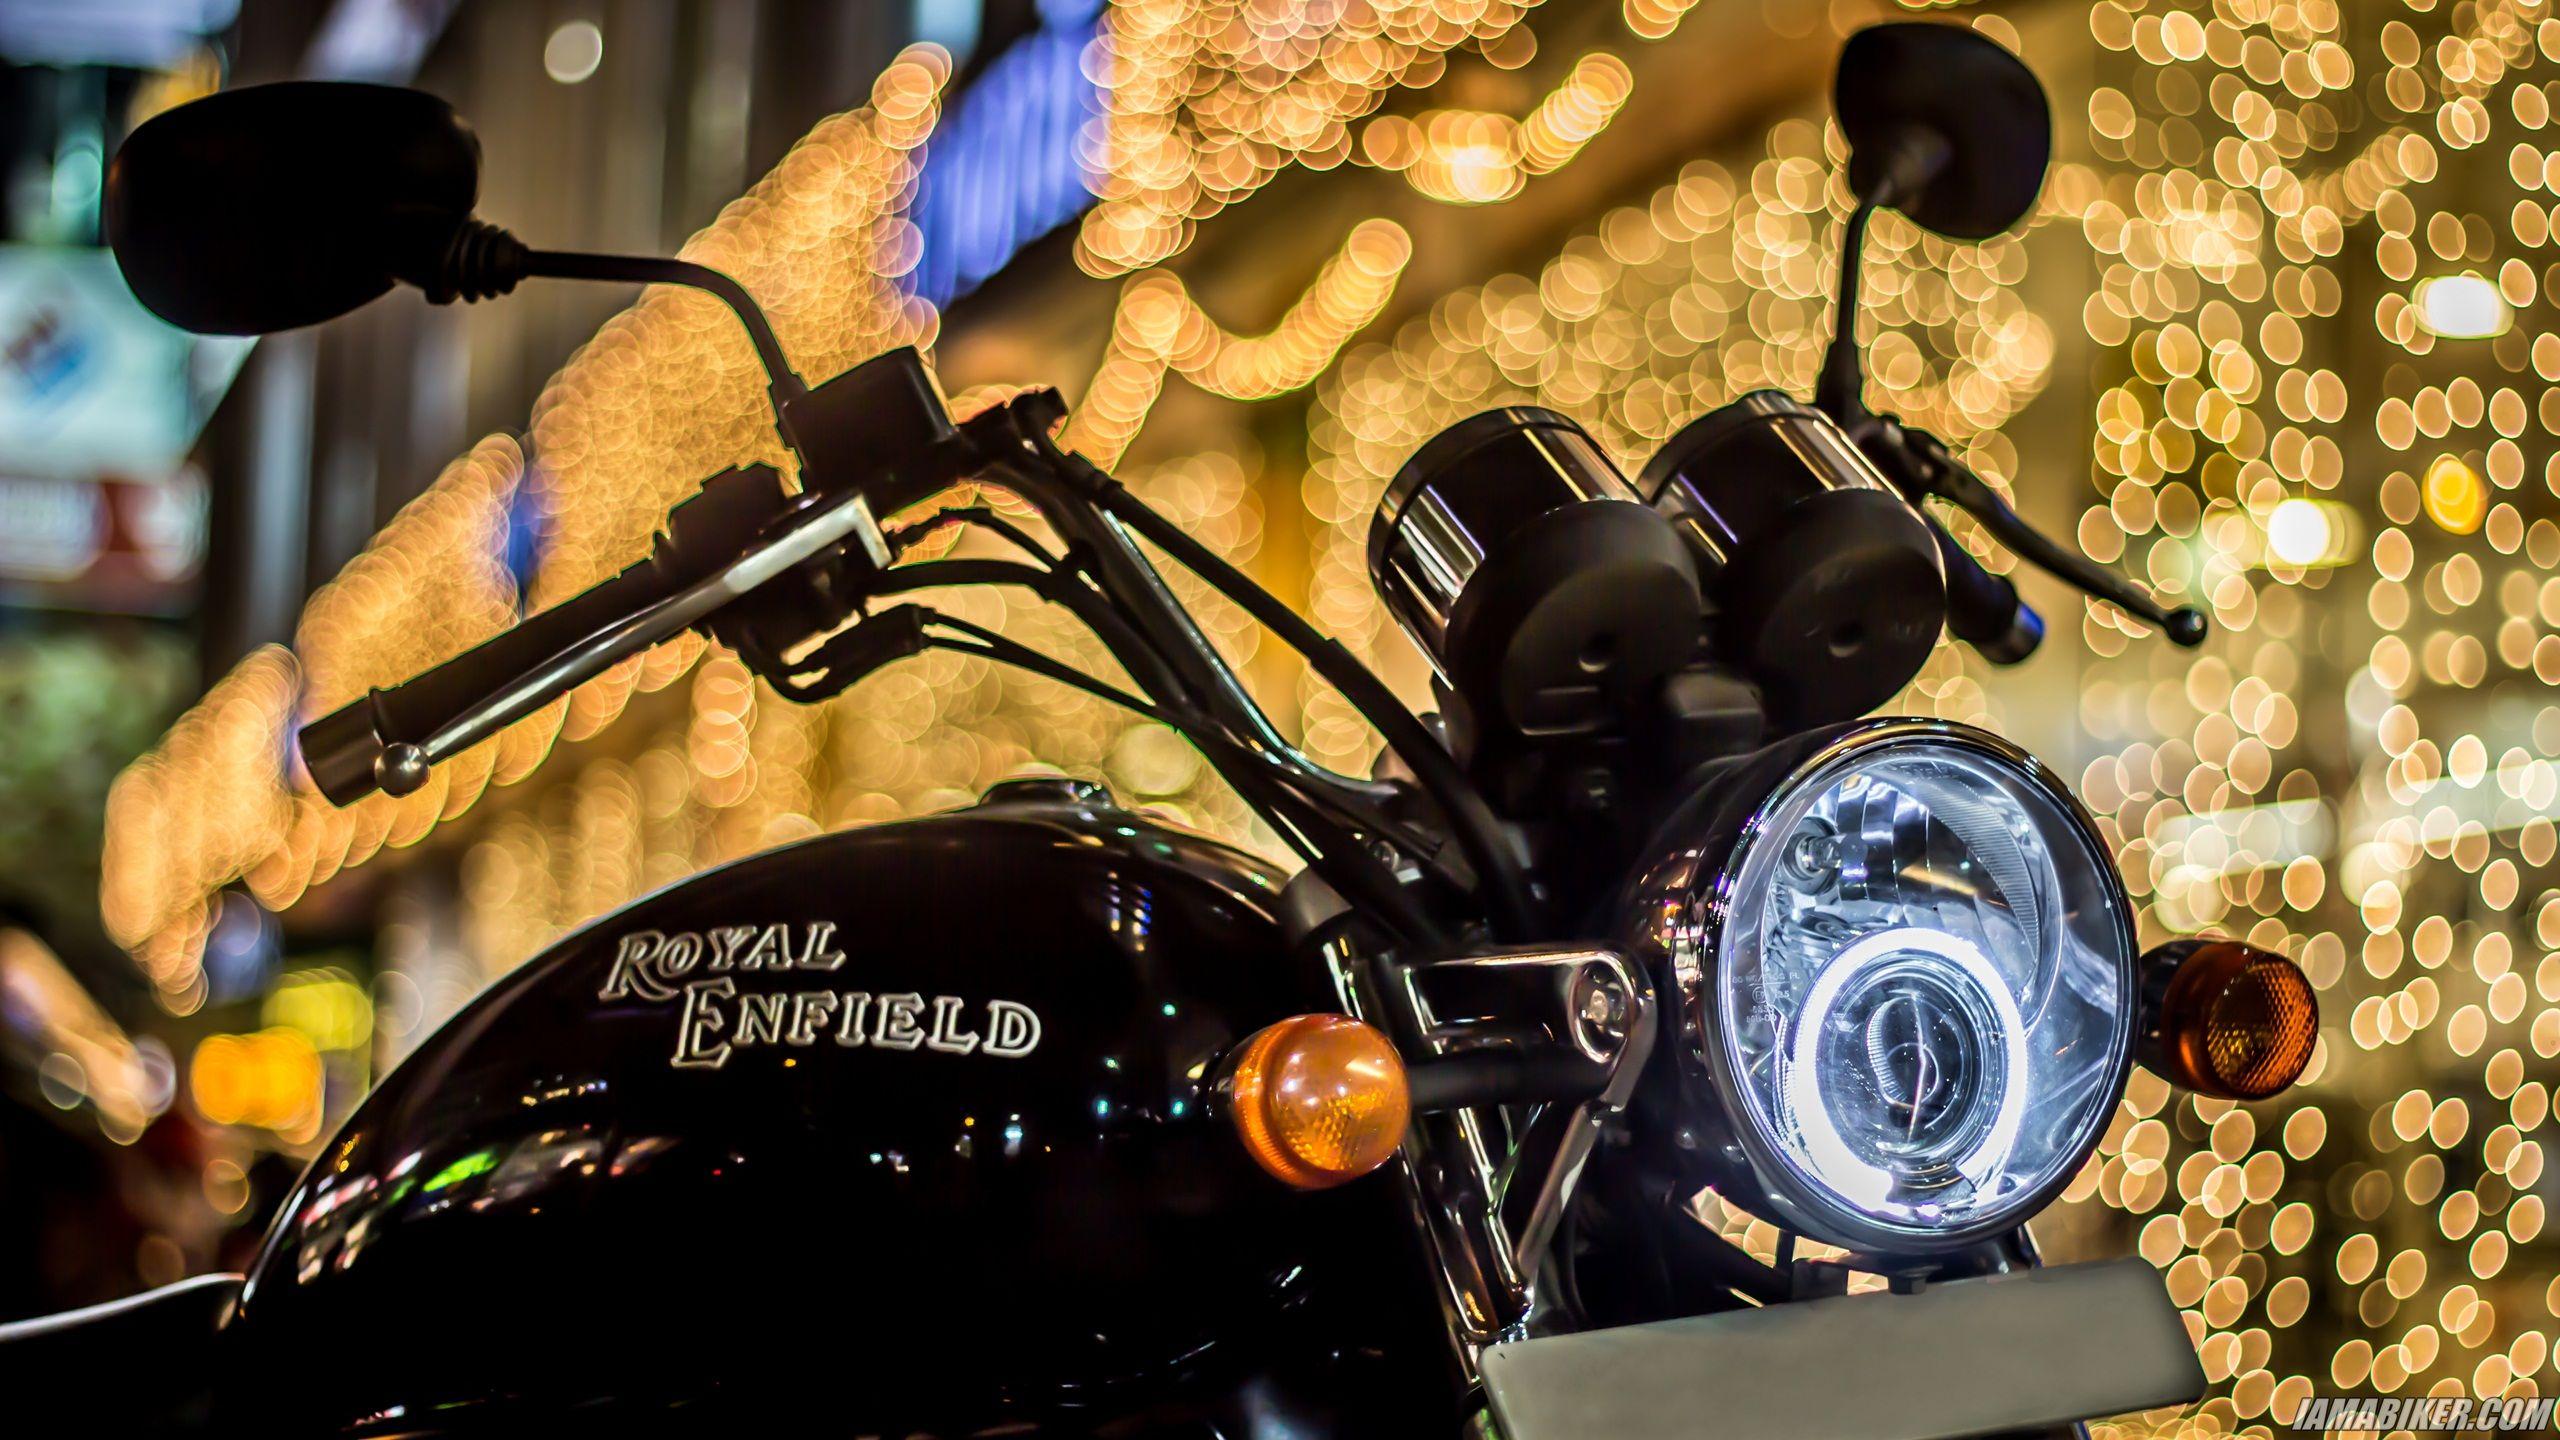 Royal enfield thunderbird 500cc price in nepal - Diwali Hd Wallpapers Royal Enfield Thunderbird 500